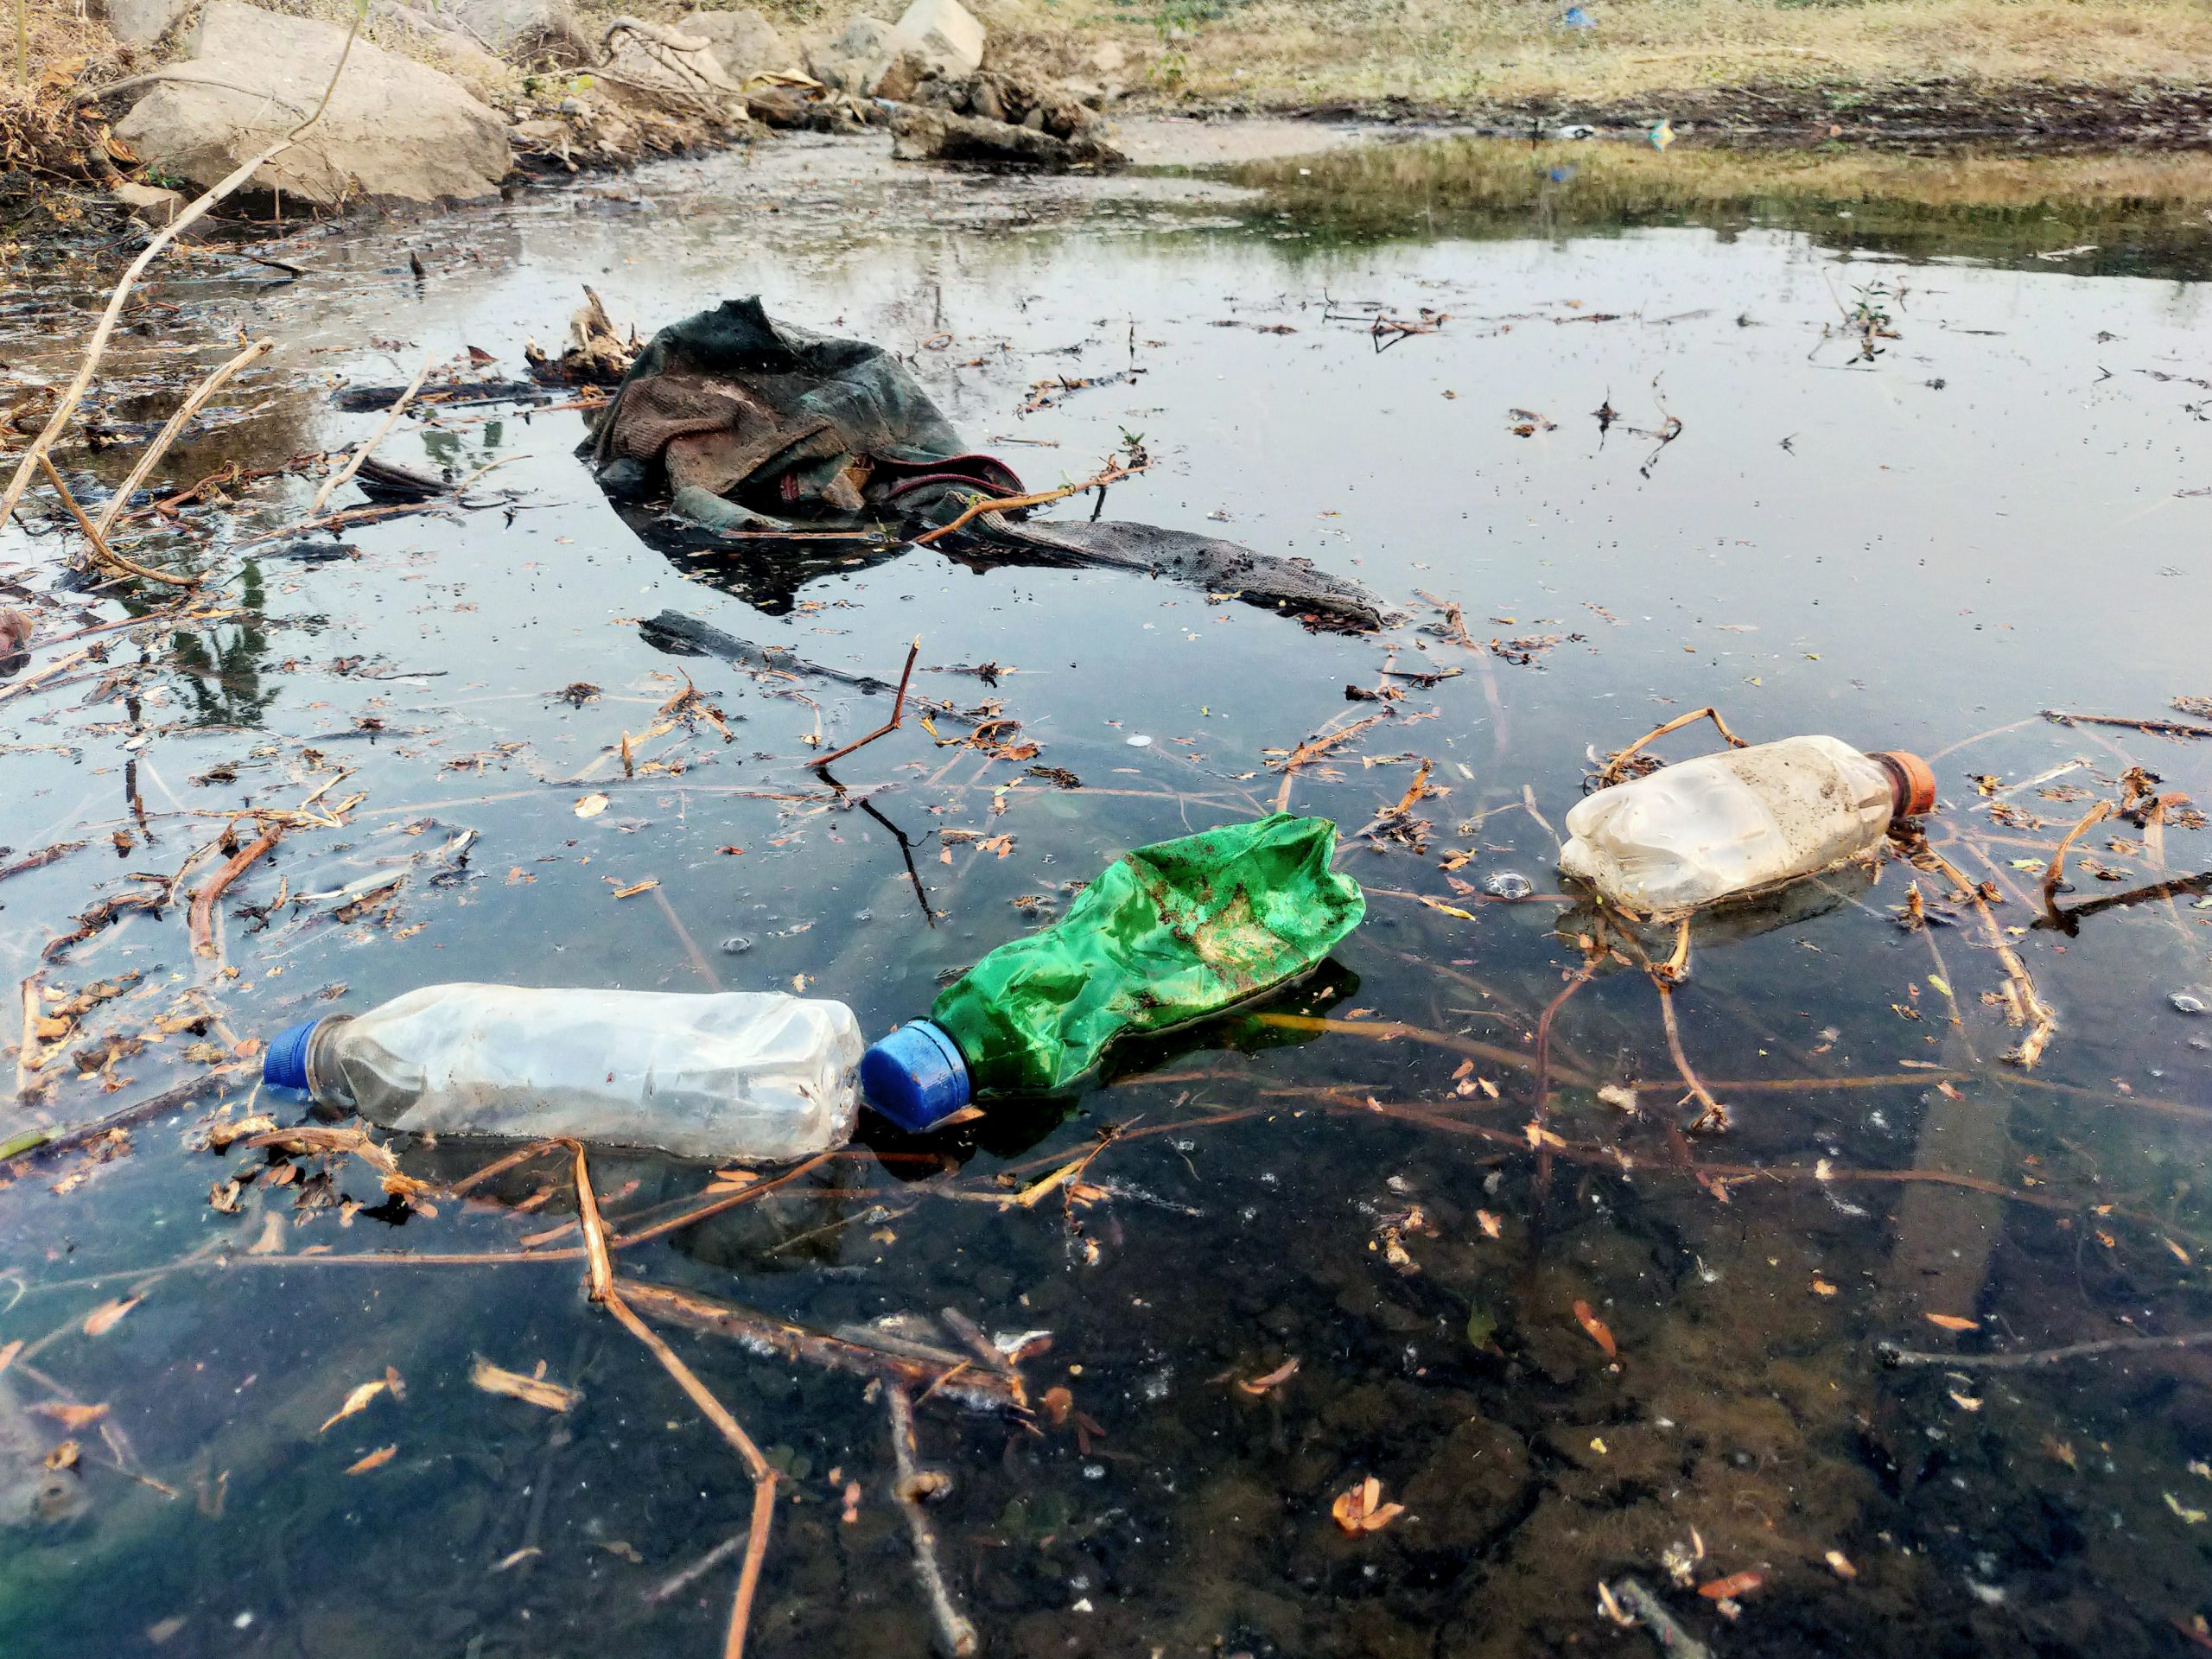 Plastic bottles in a water